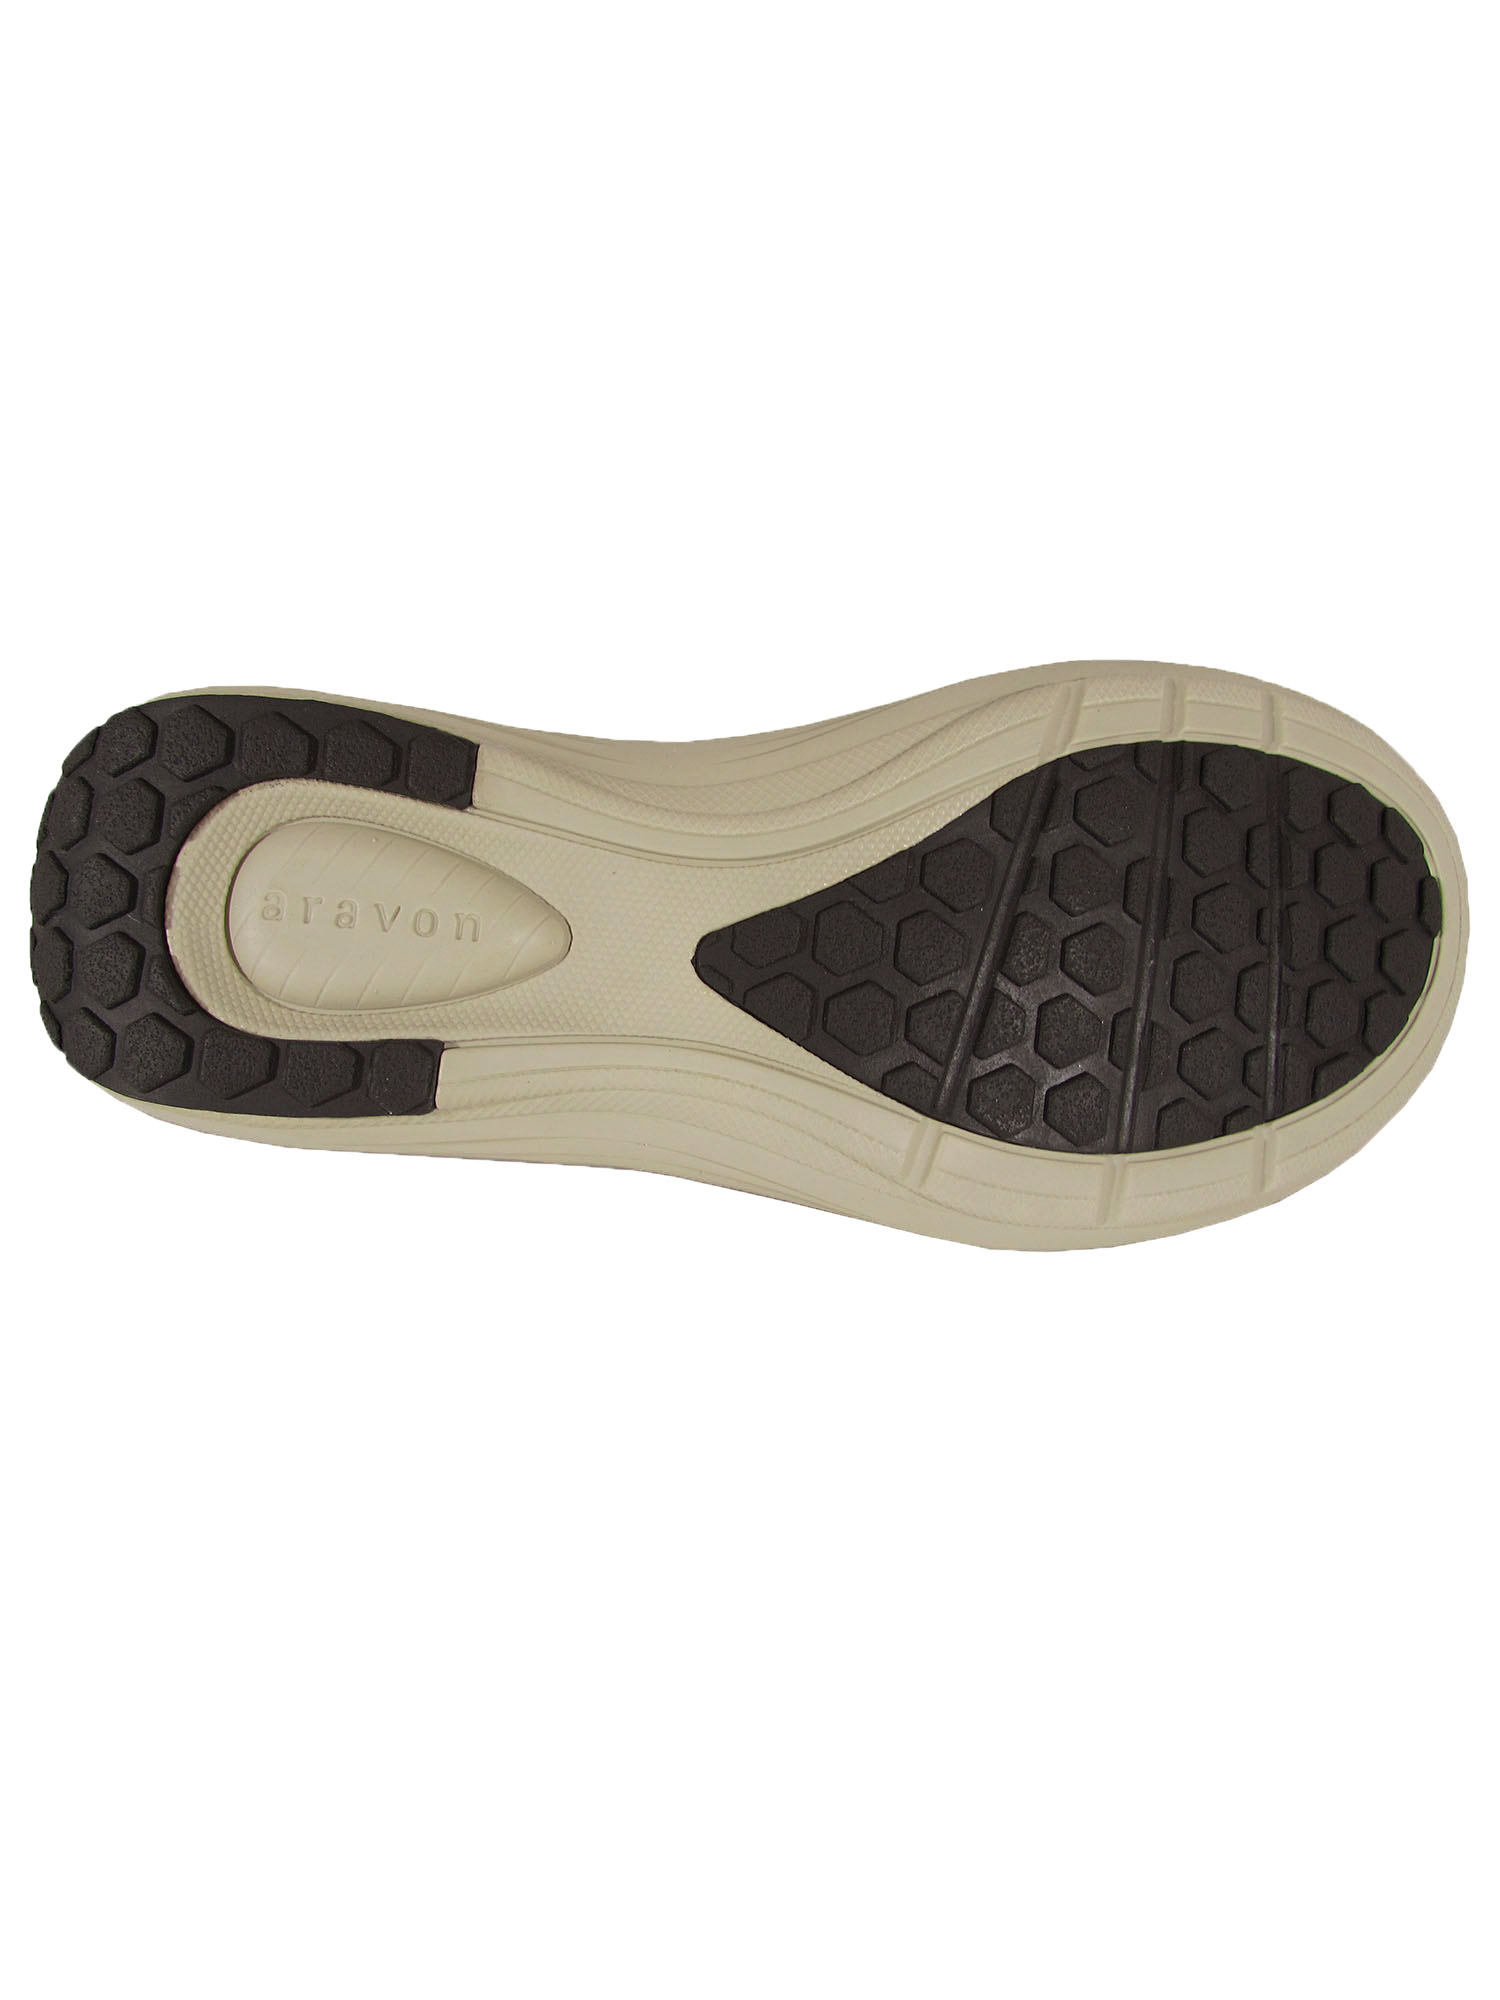 Aravon-Womens-Bonnie-AR-Slip-On-Loafer-Shoes miniatura 6